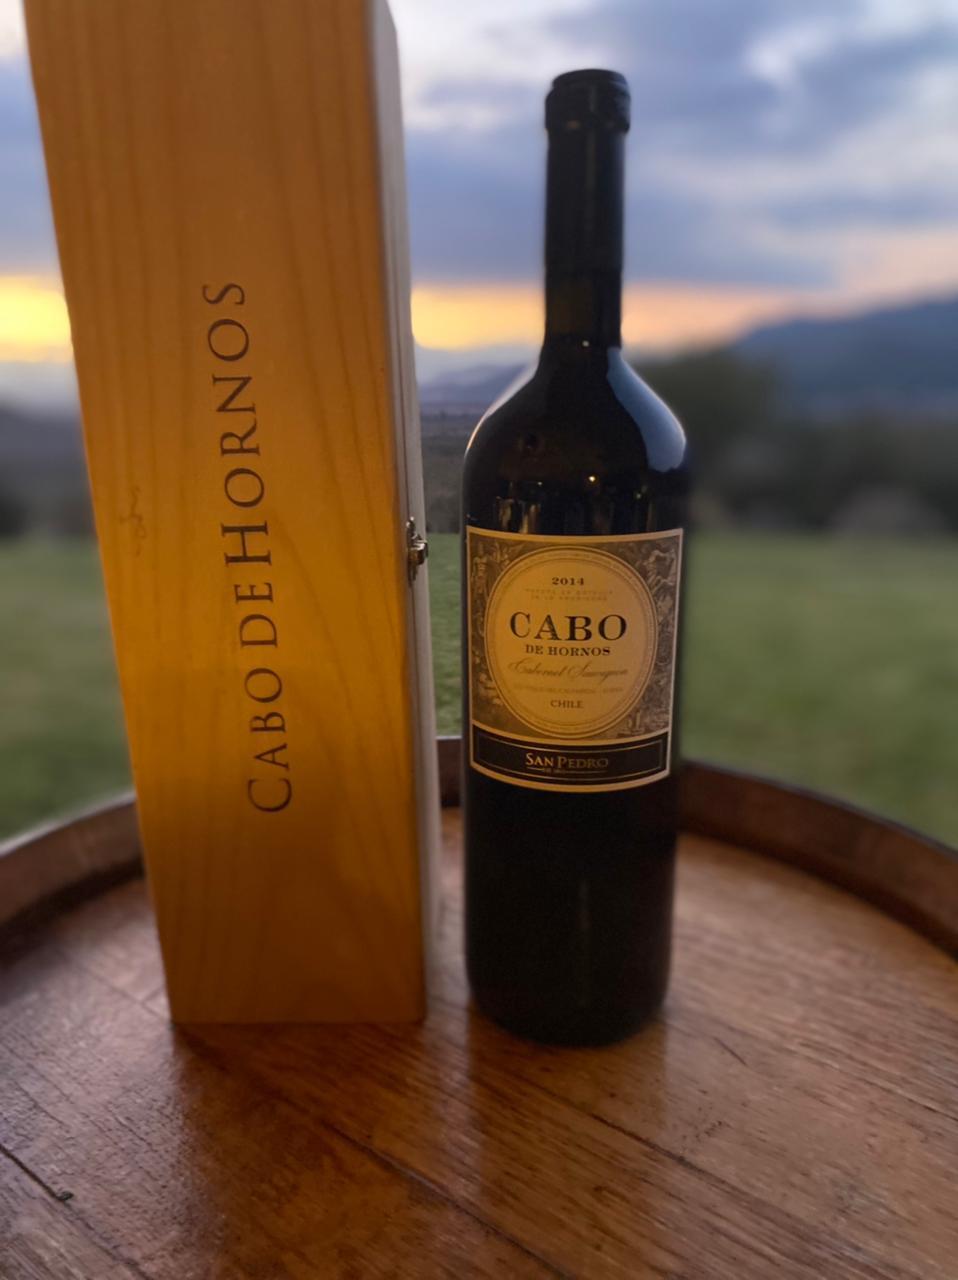 Tercera cata vertical de vinos íconos chilenos